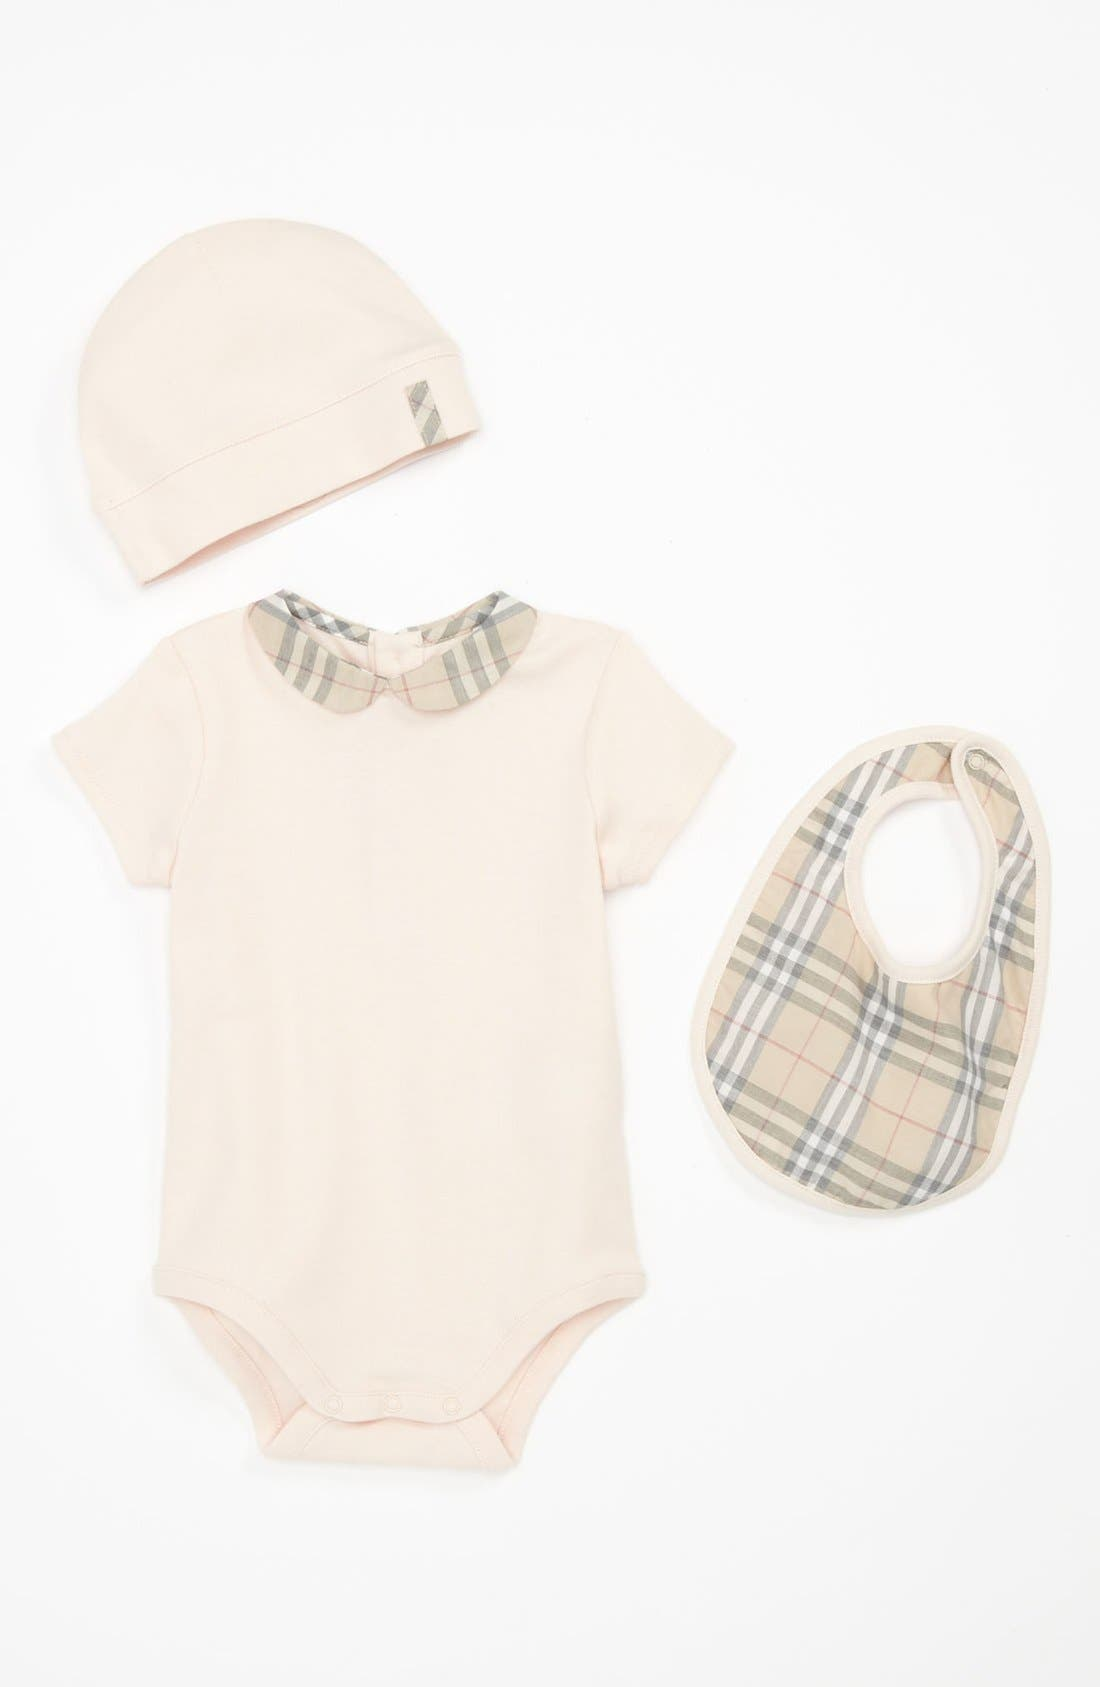 Alternate Image 1 Selected - Burberry Bodysuit, Bib & Hat Gift Set (Baby)